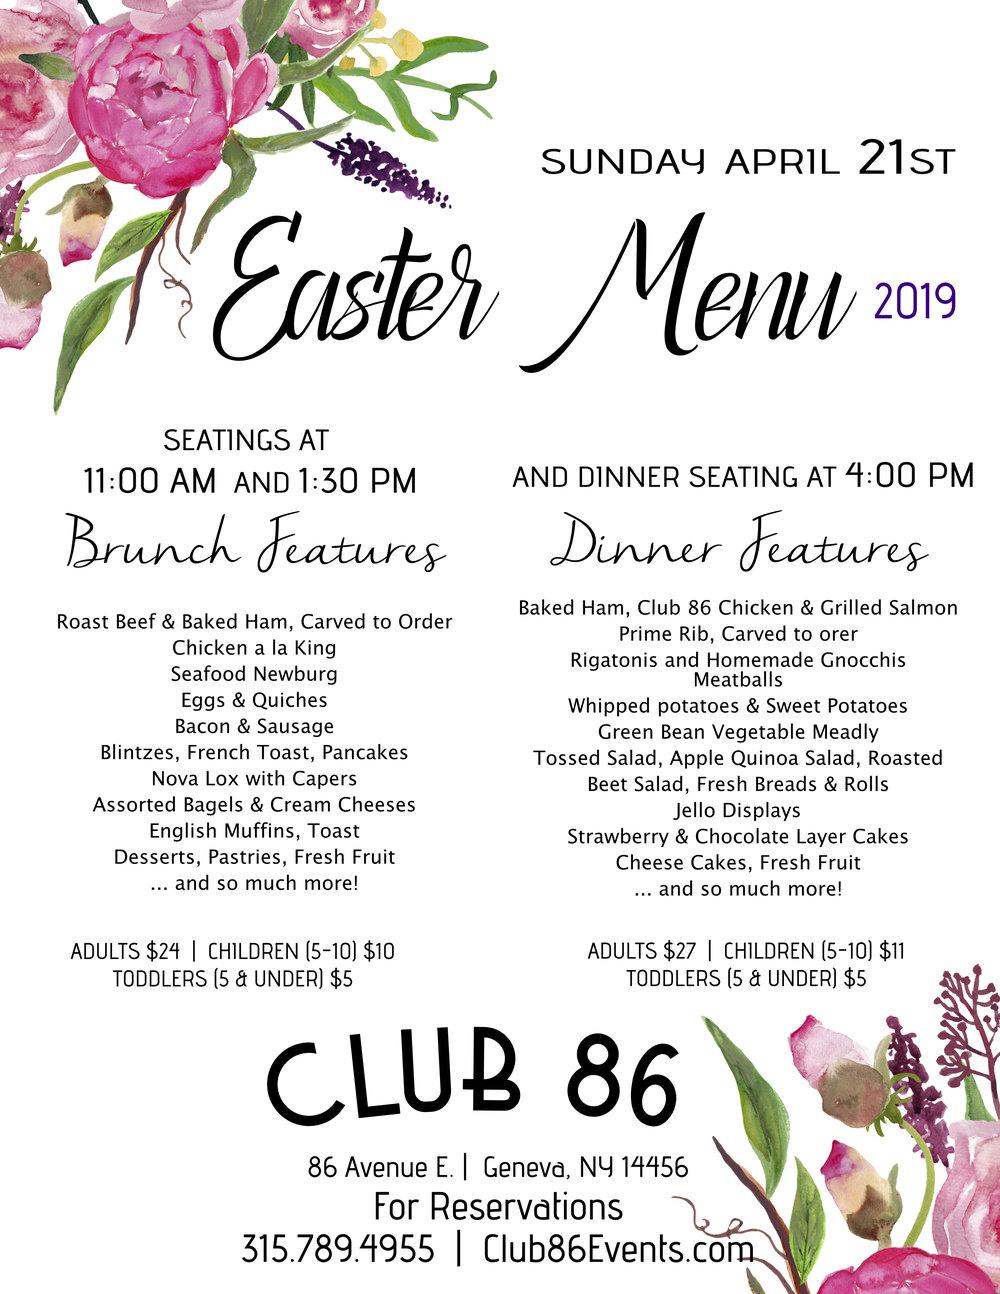 Easter Brunch - Sunday April 21st 2019 CLICK HERE FOR RESERVATIONS